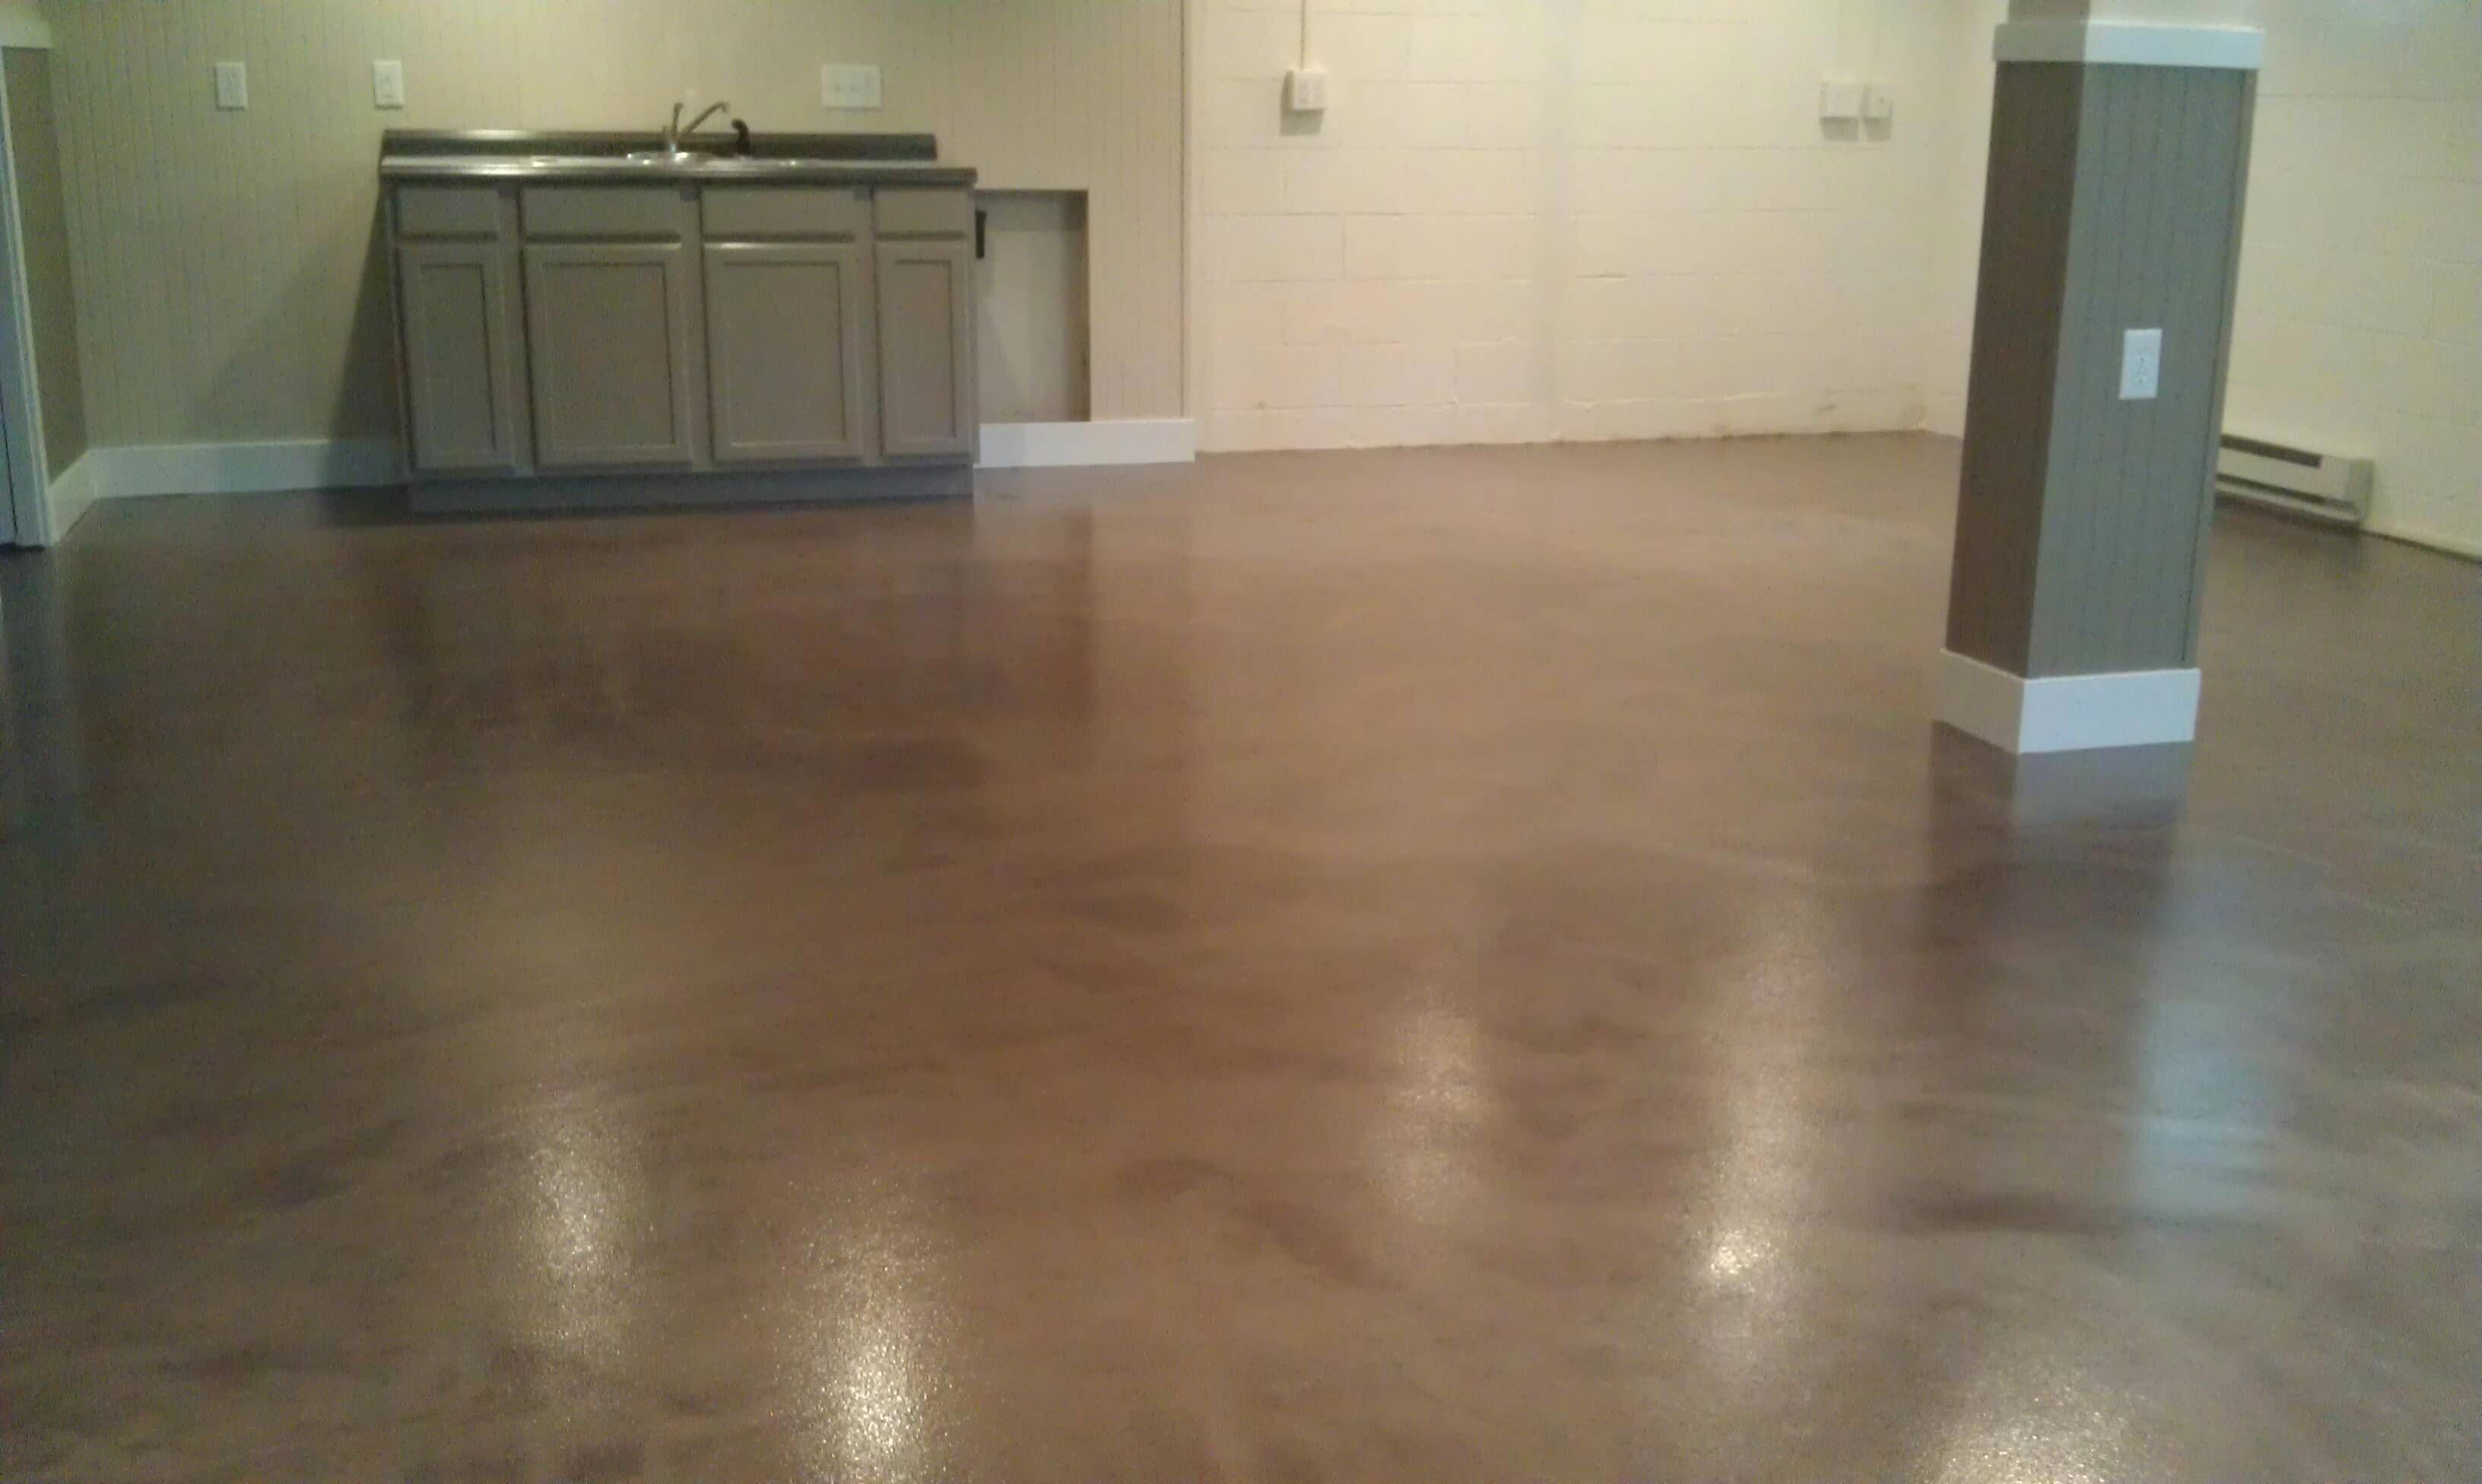 waterproof concrete basement floor ekenasfiber johnhenriksson se u2022 rh ekenasfiber johnhenriksson se